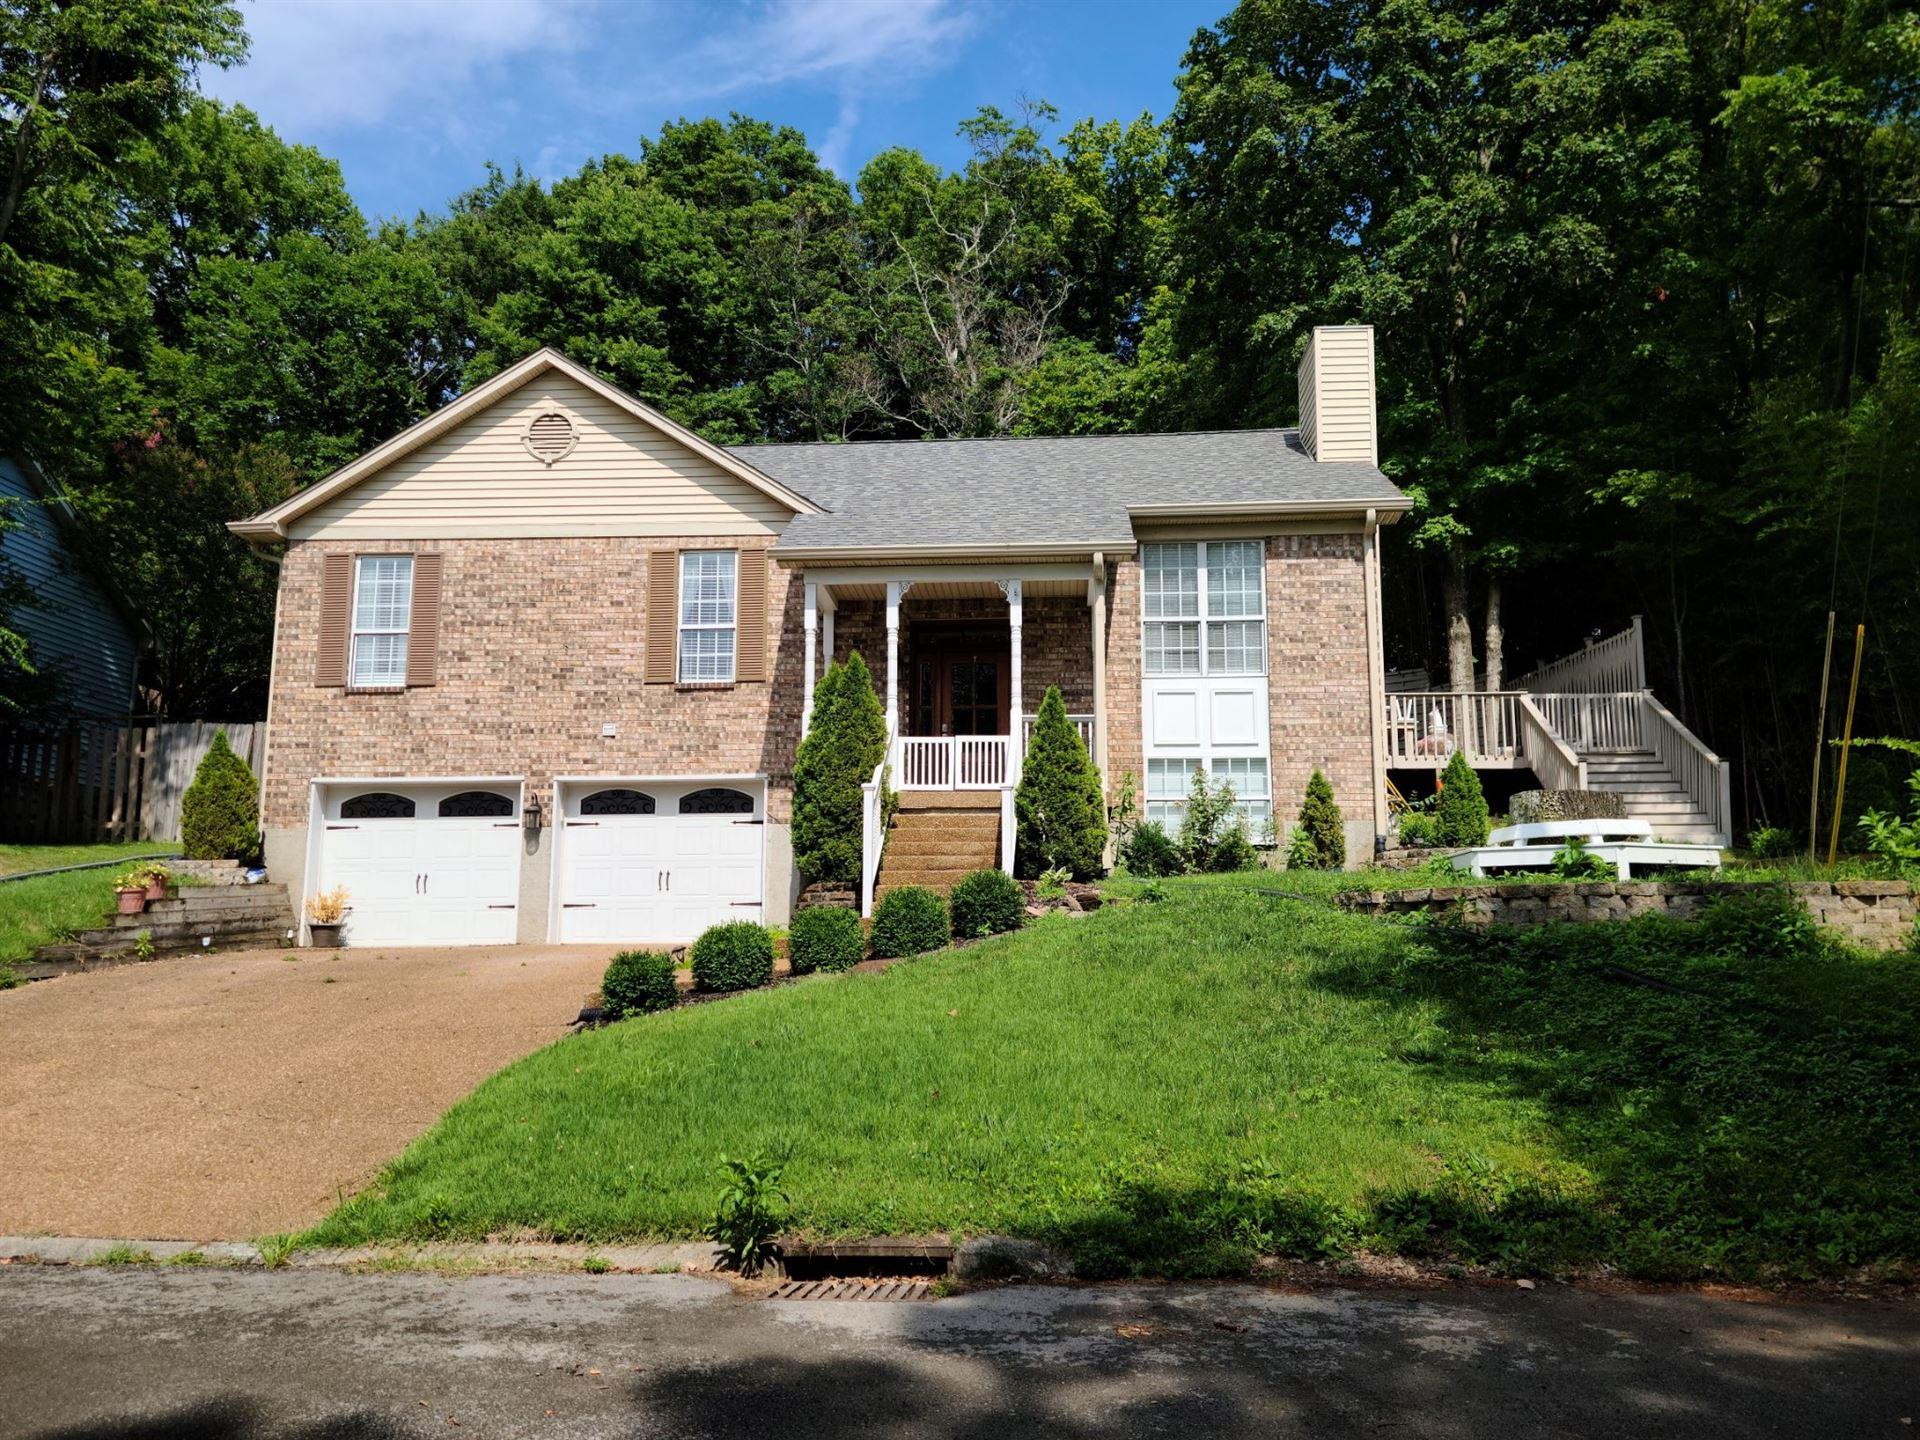 1339 Paulson Way, Antioch, TN 37013 - MLS#: 2276103